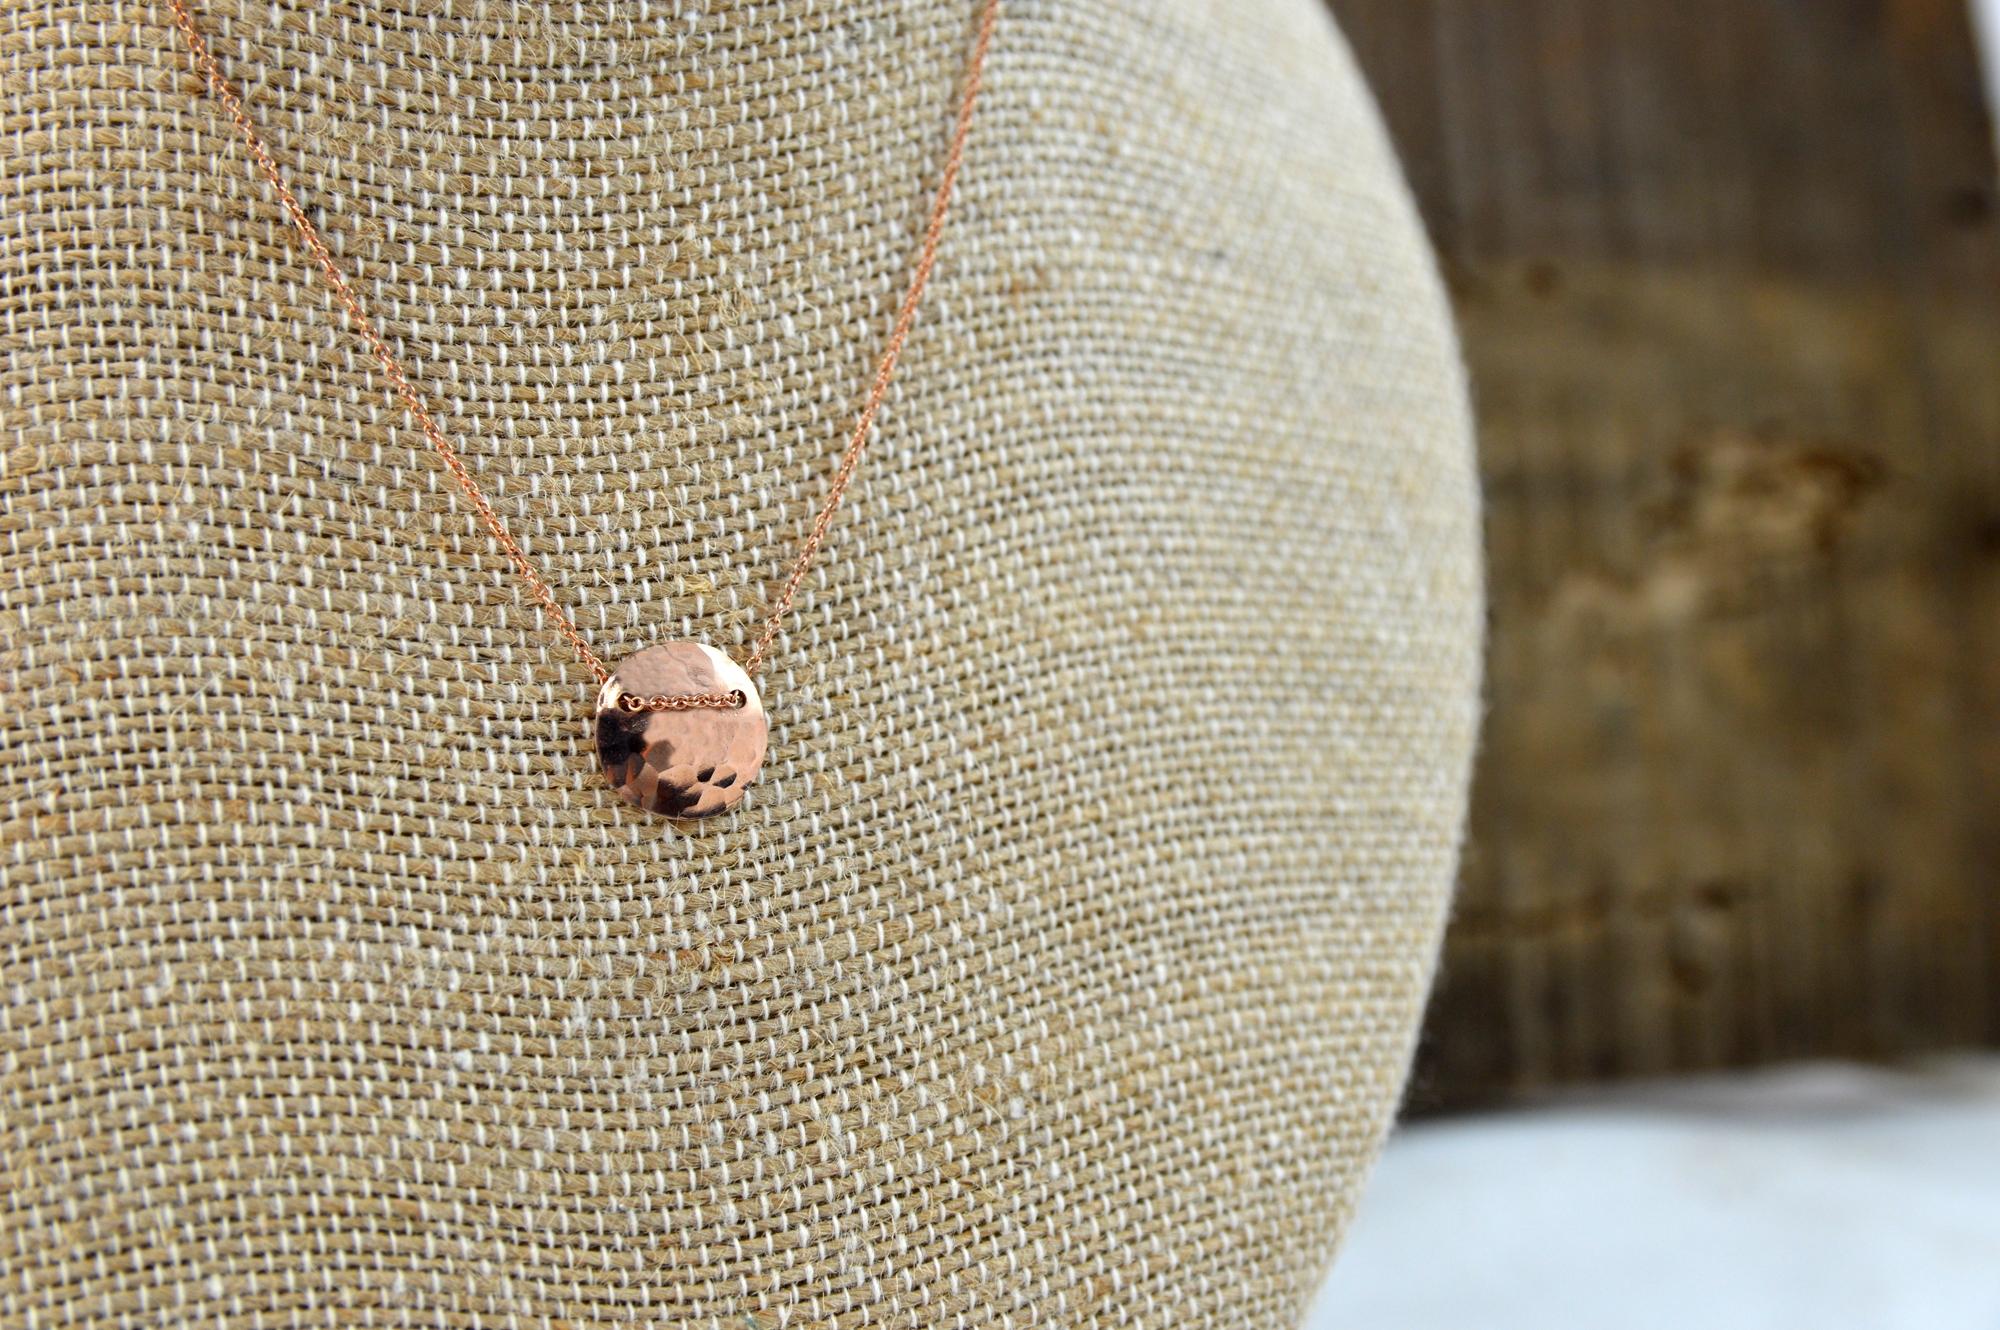 rose gold neckalce made in buffalo ny gift shop